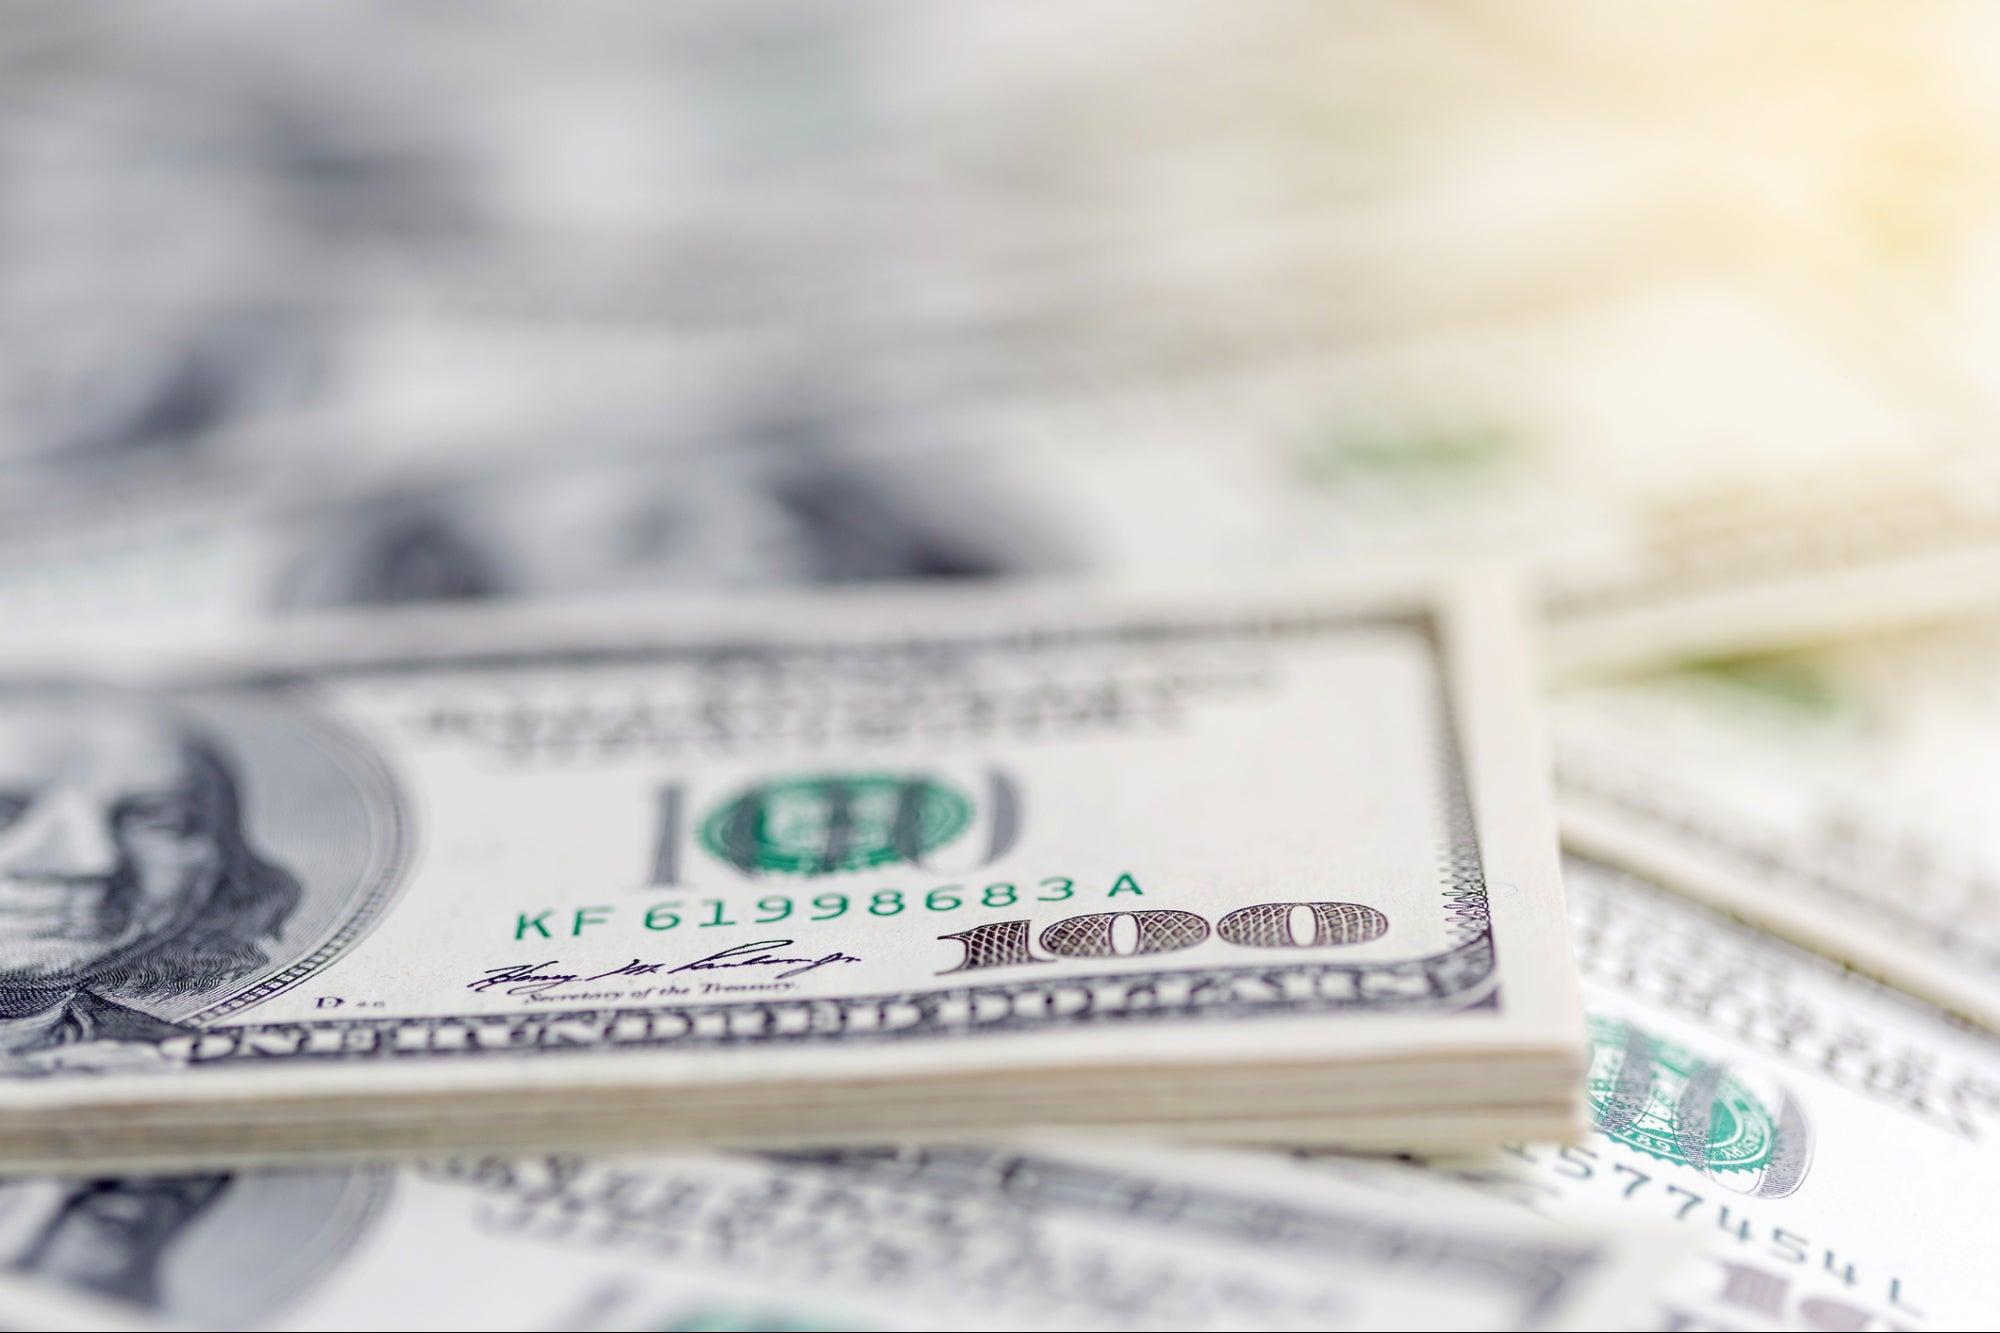 Free Webinar | June 11: Start Up Fundamentals, Raising Capital 101